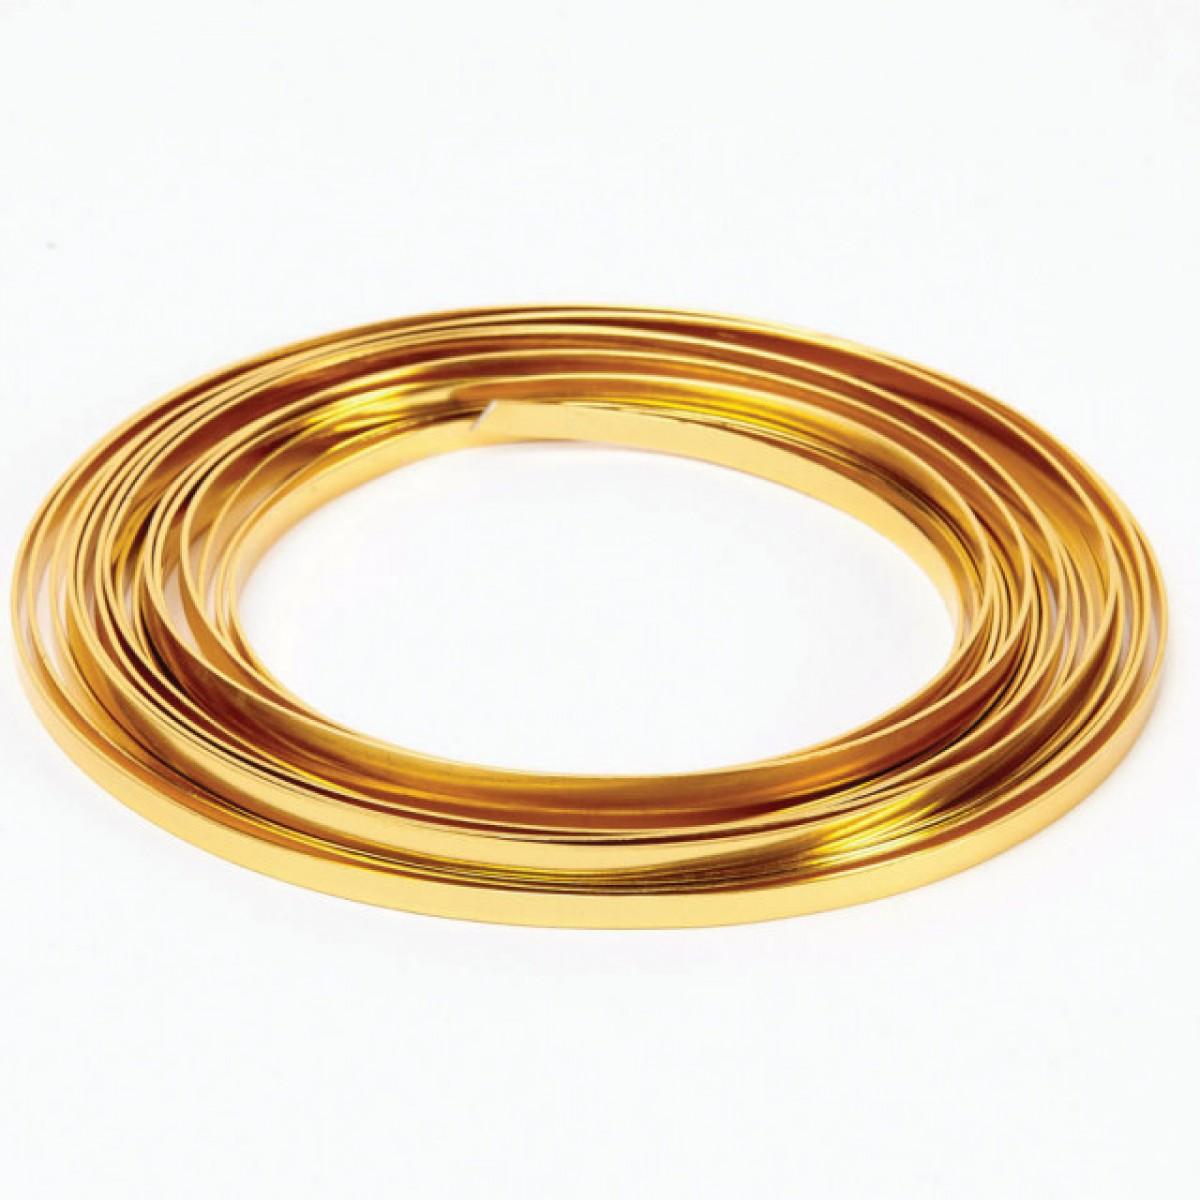 Flat Aluminium Wire Gold 1mmx5mmx100g 1 No